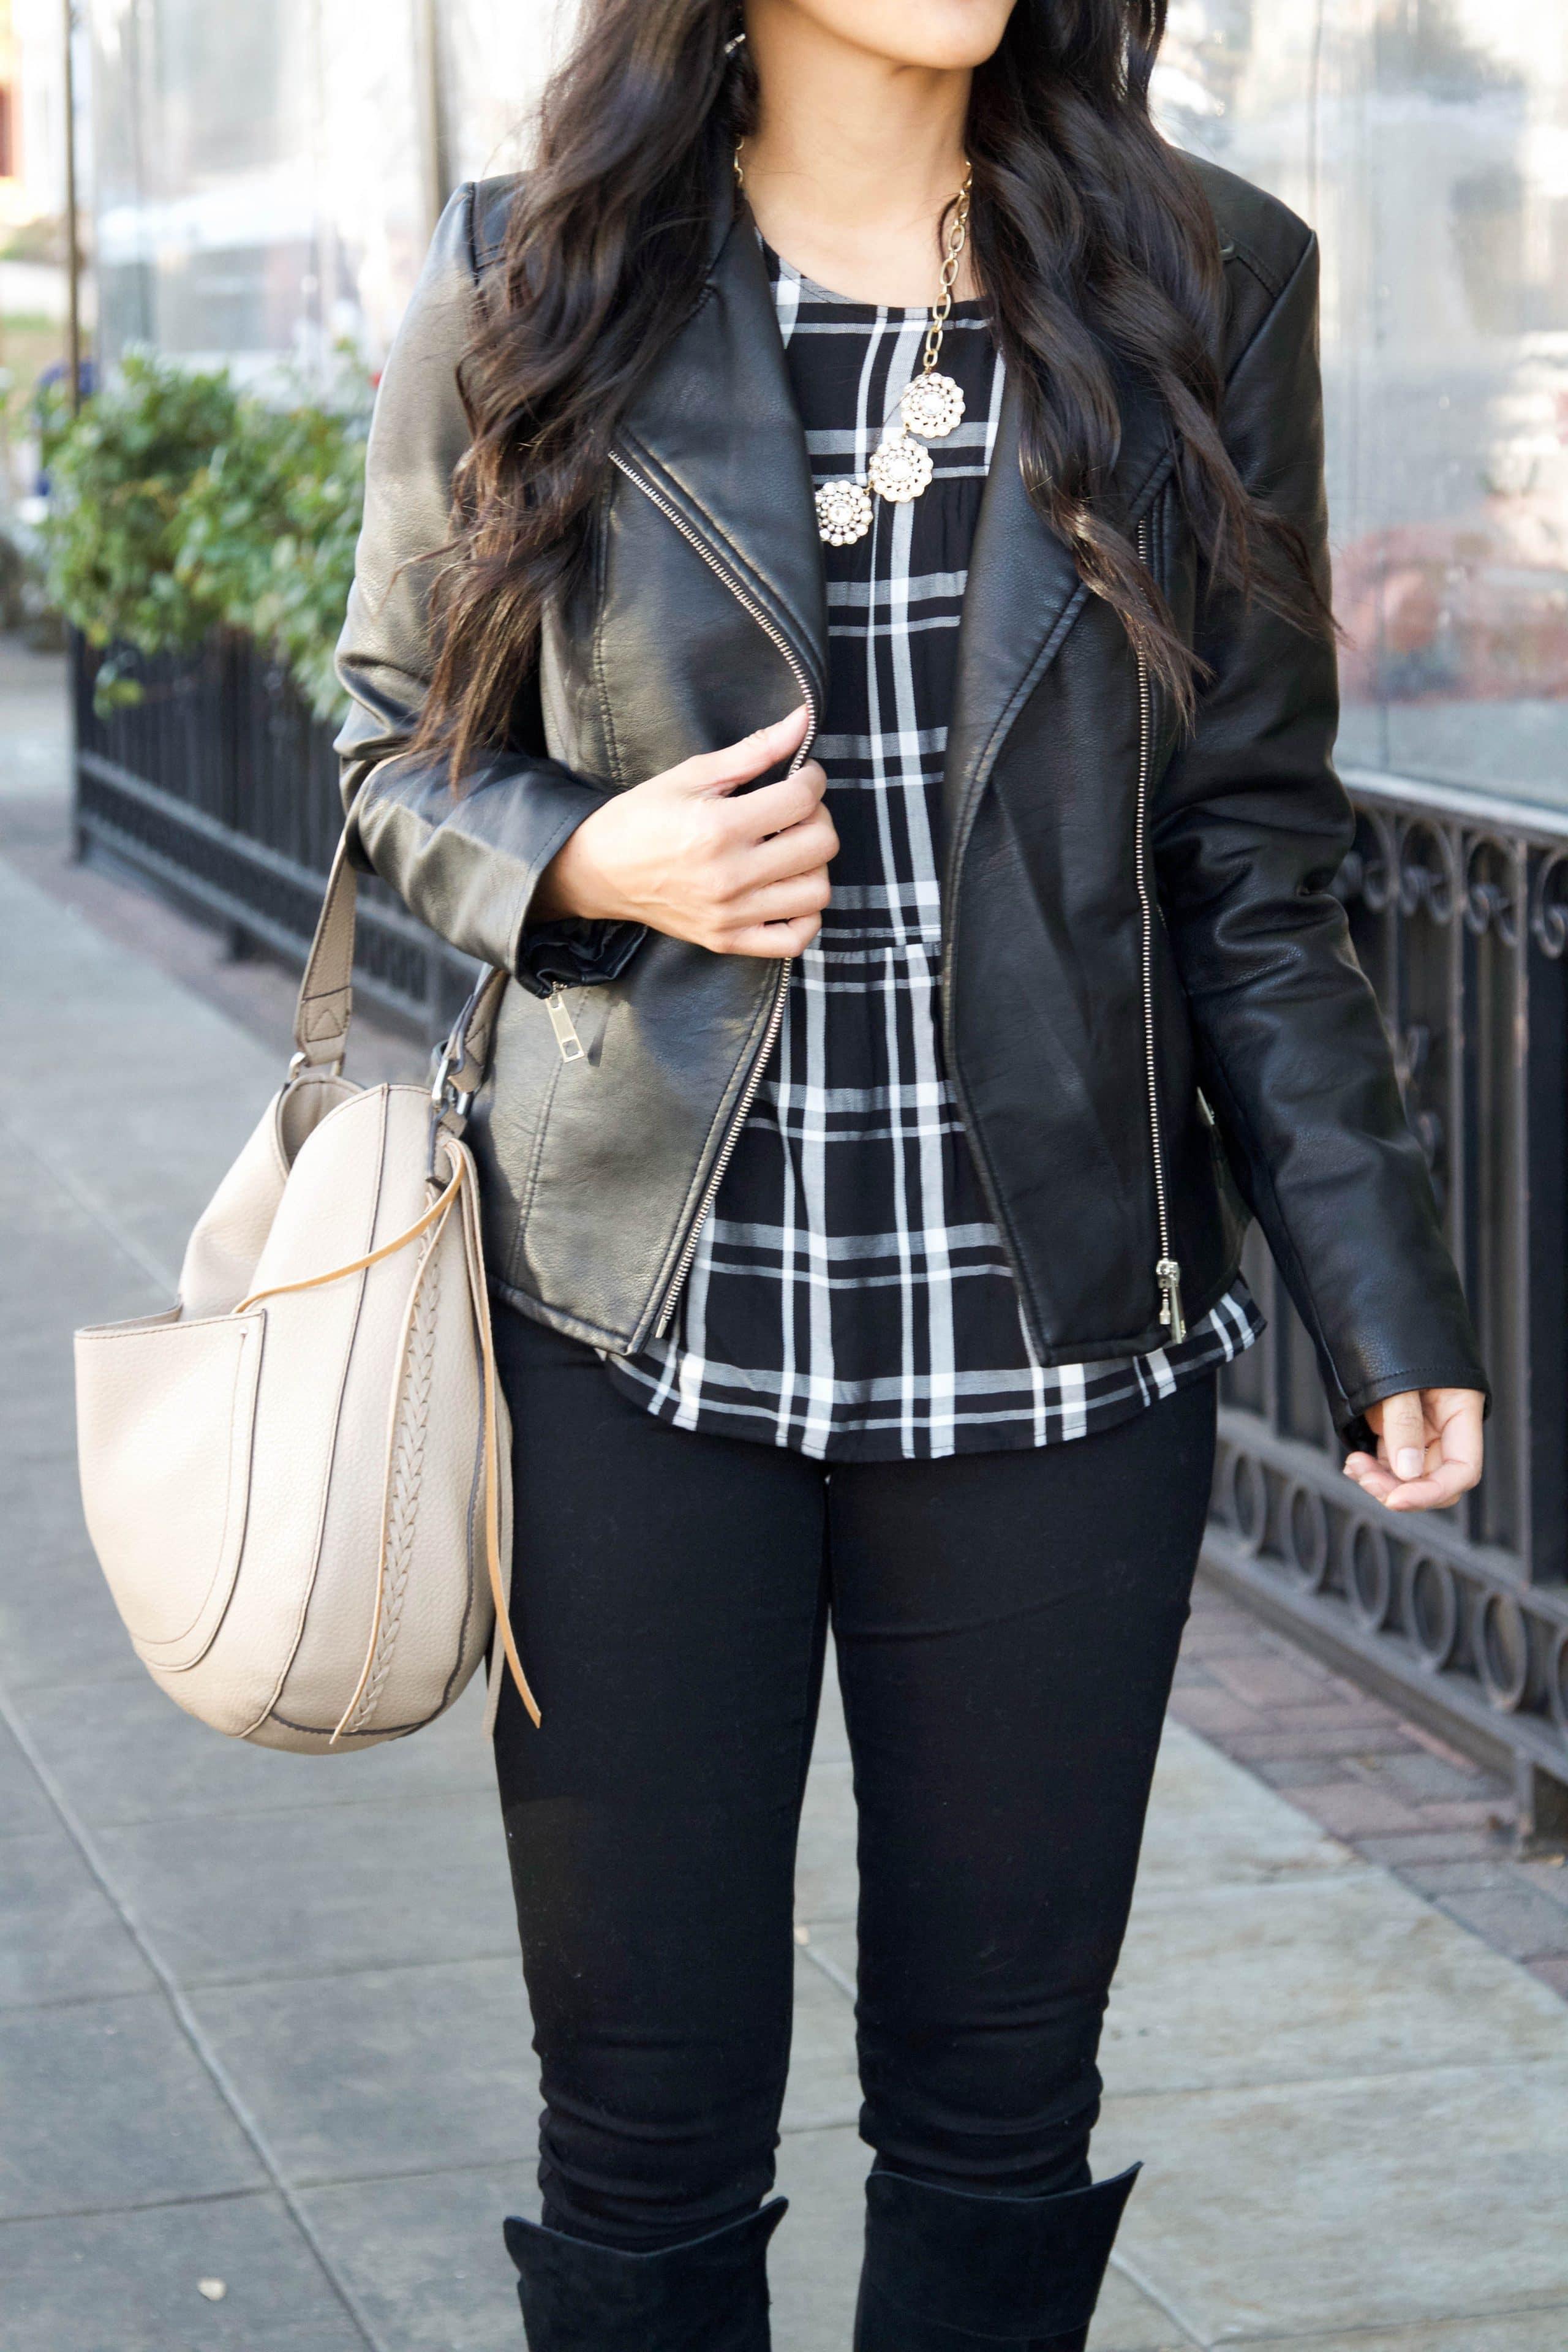 Black moto + black jeans + black tall boots + tan bag